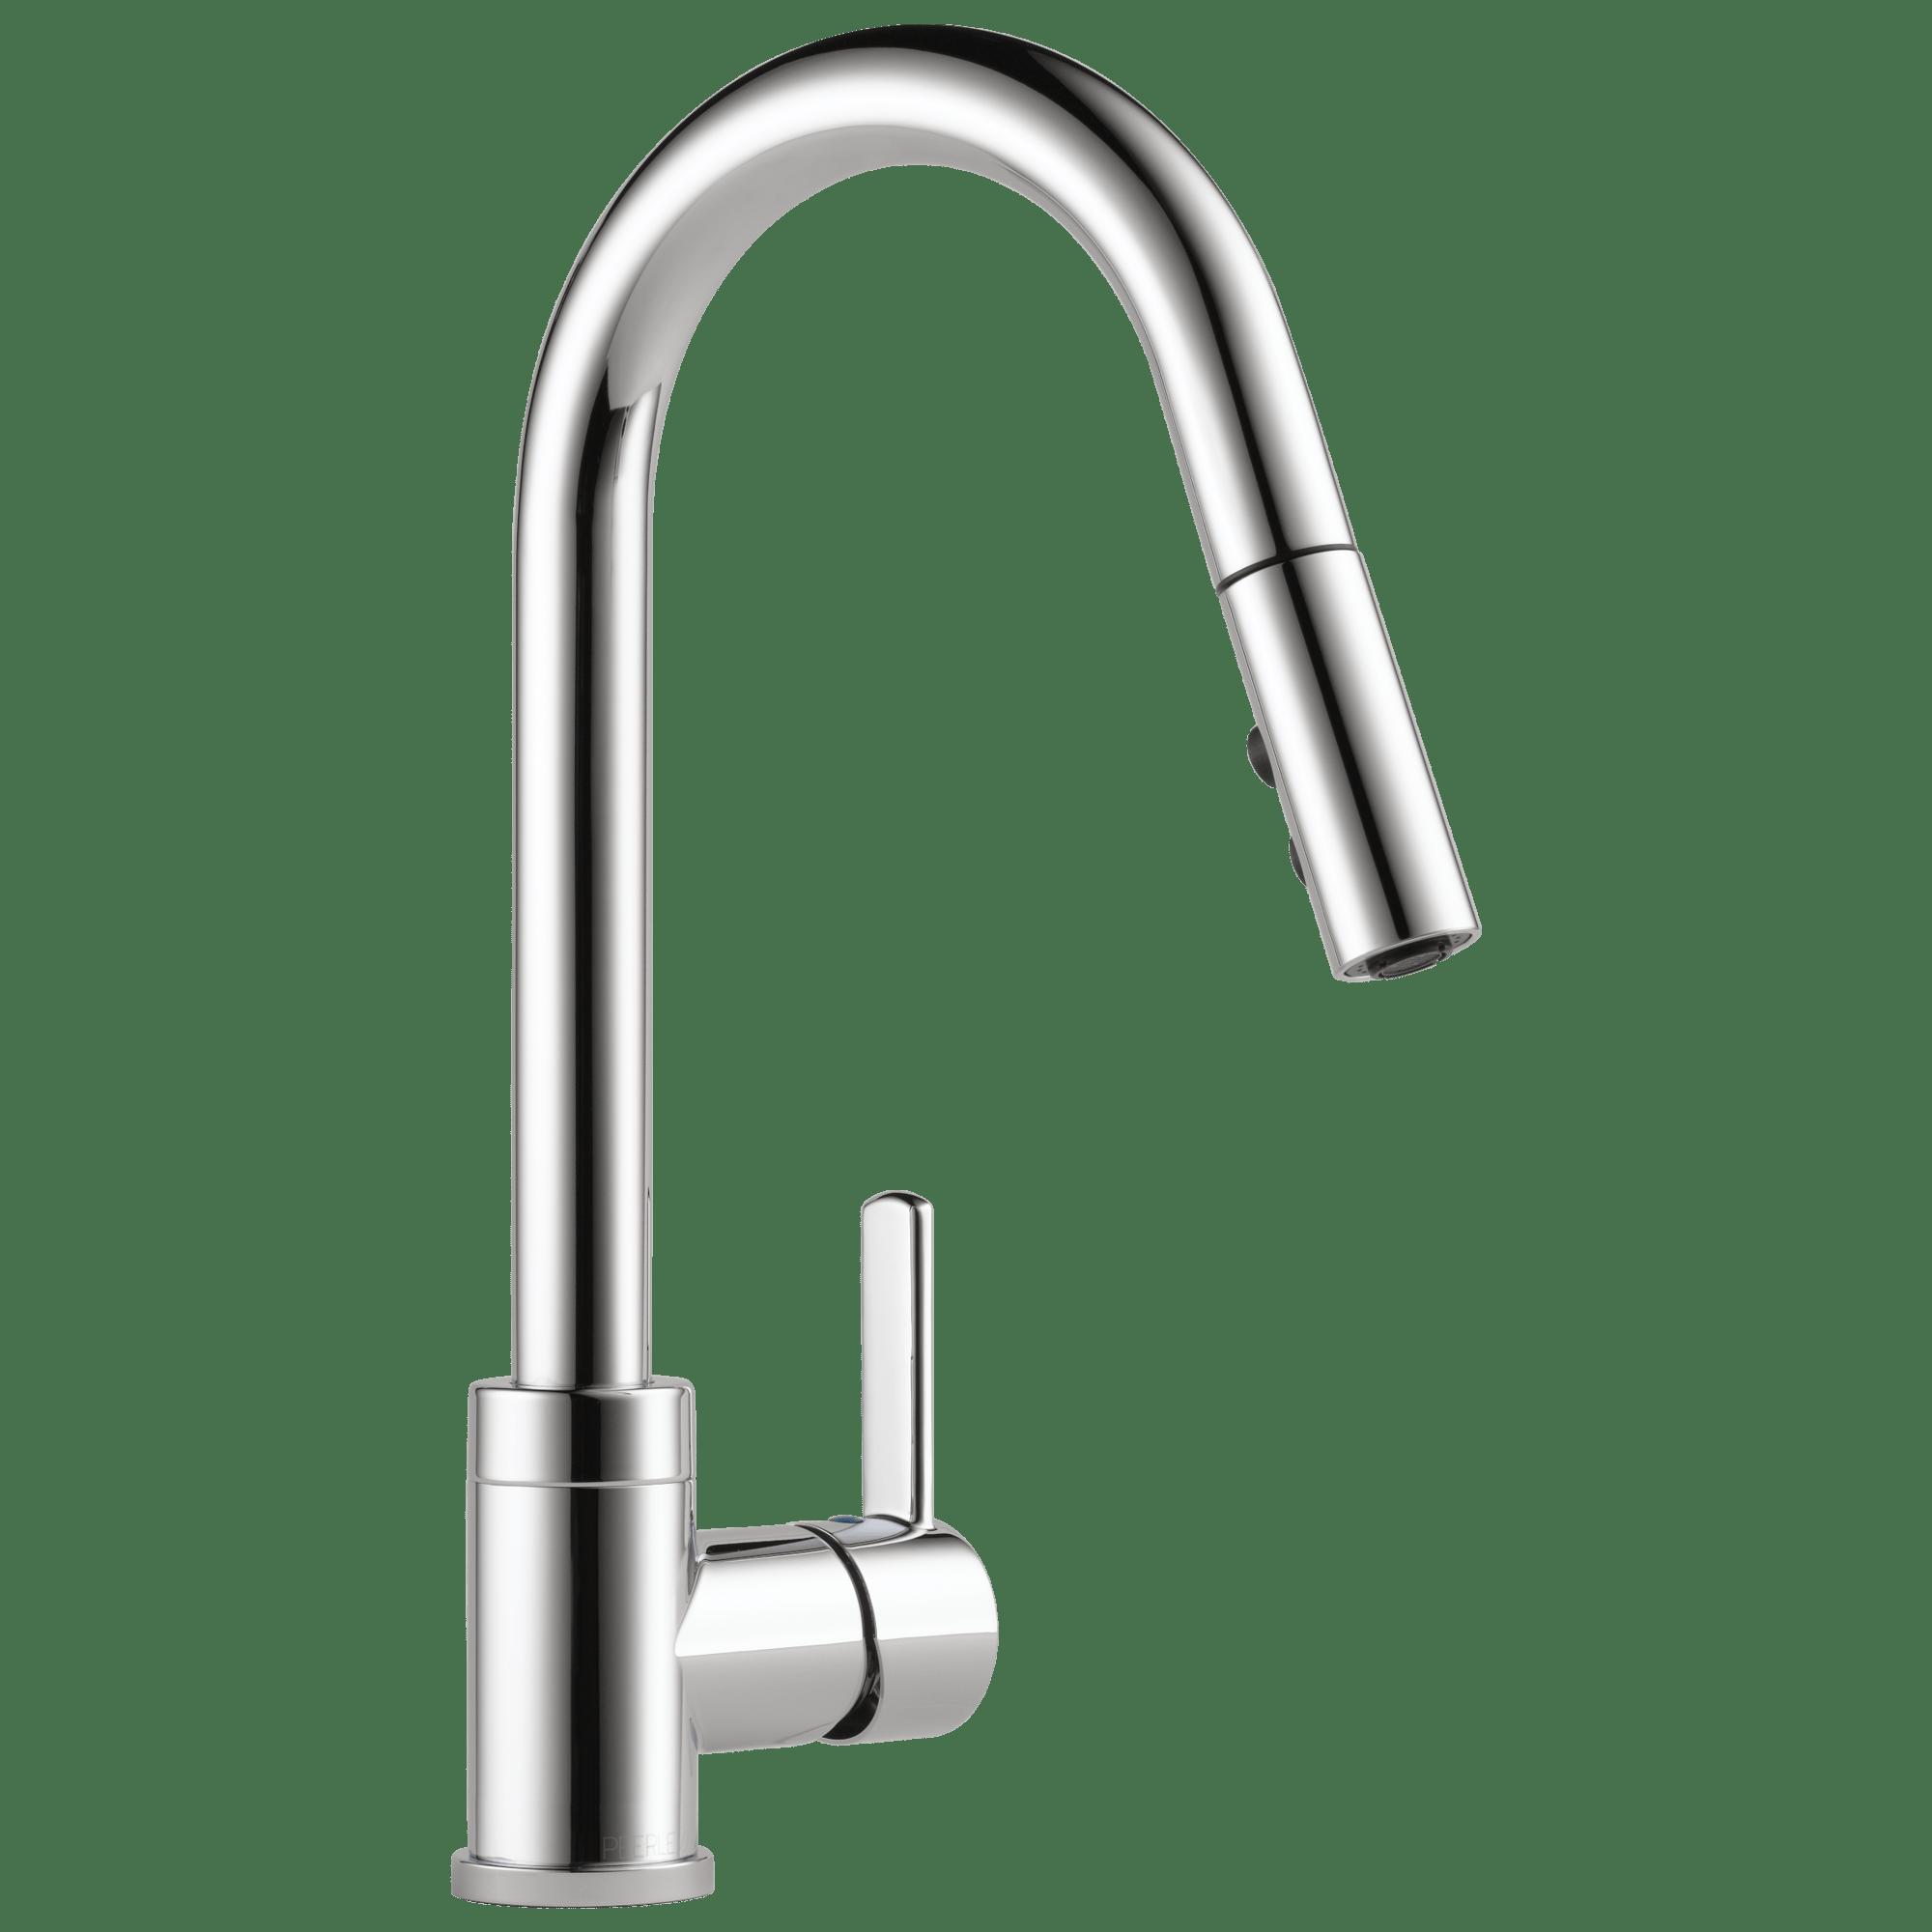 peerlessfaucet delta linden kitchen faucet Single Handle Pull Down Kitchen Faucet